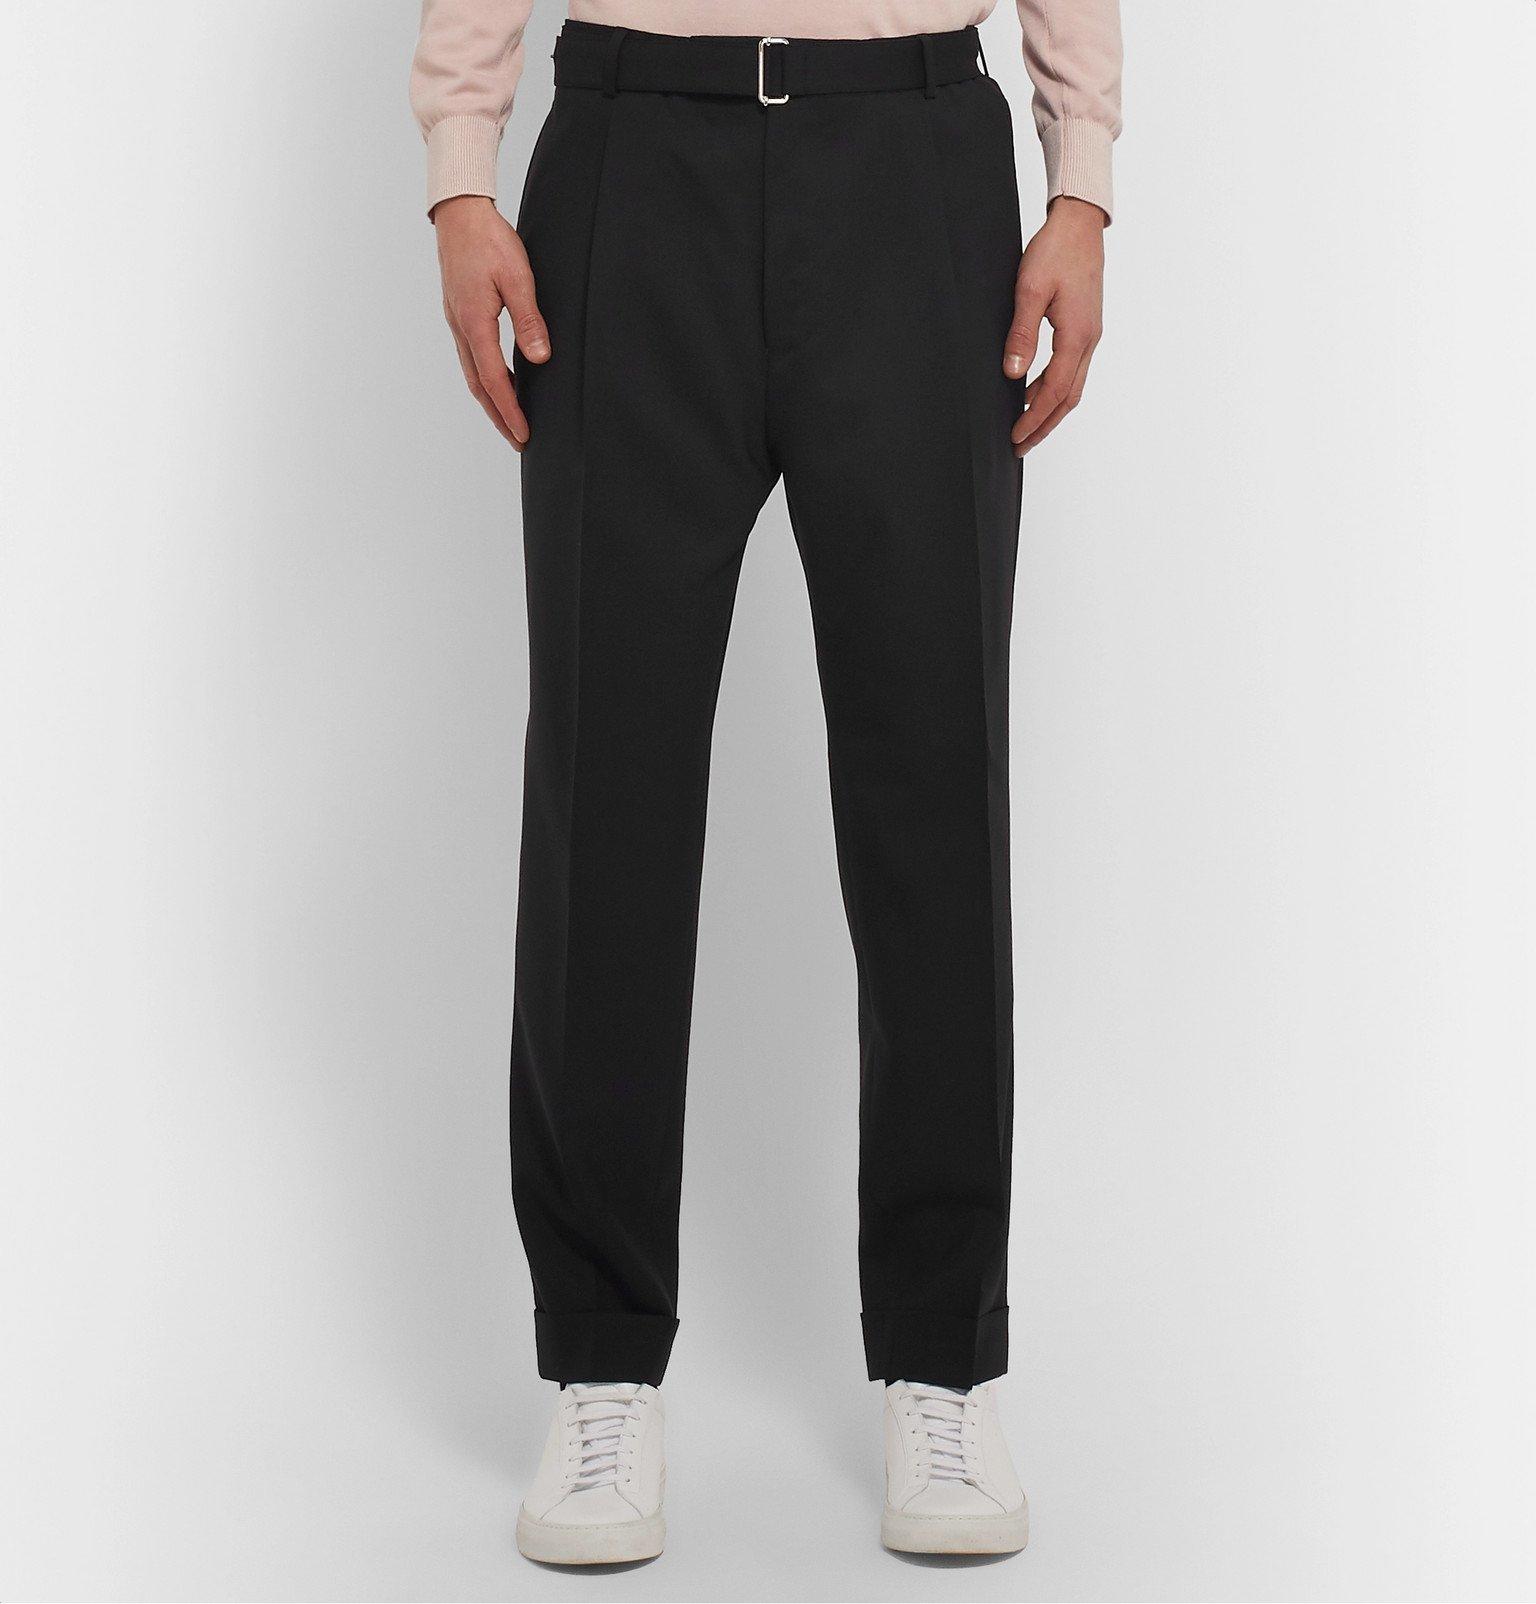 Officine Generale - Black Hugo Tapered Belted Wool Suit Trousers - Black